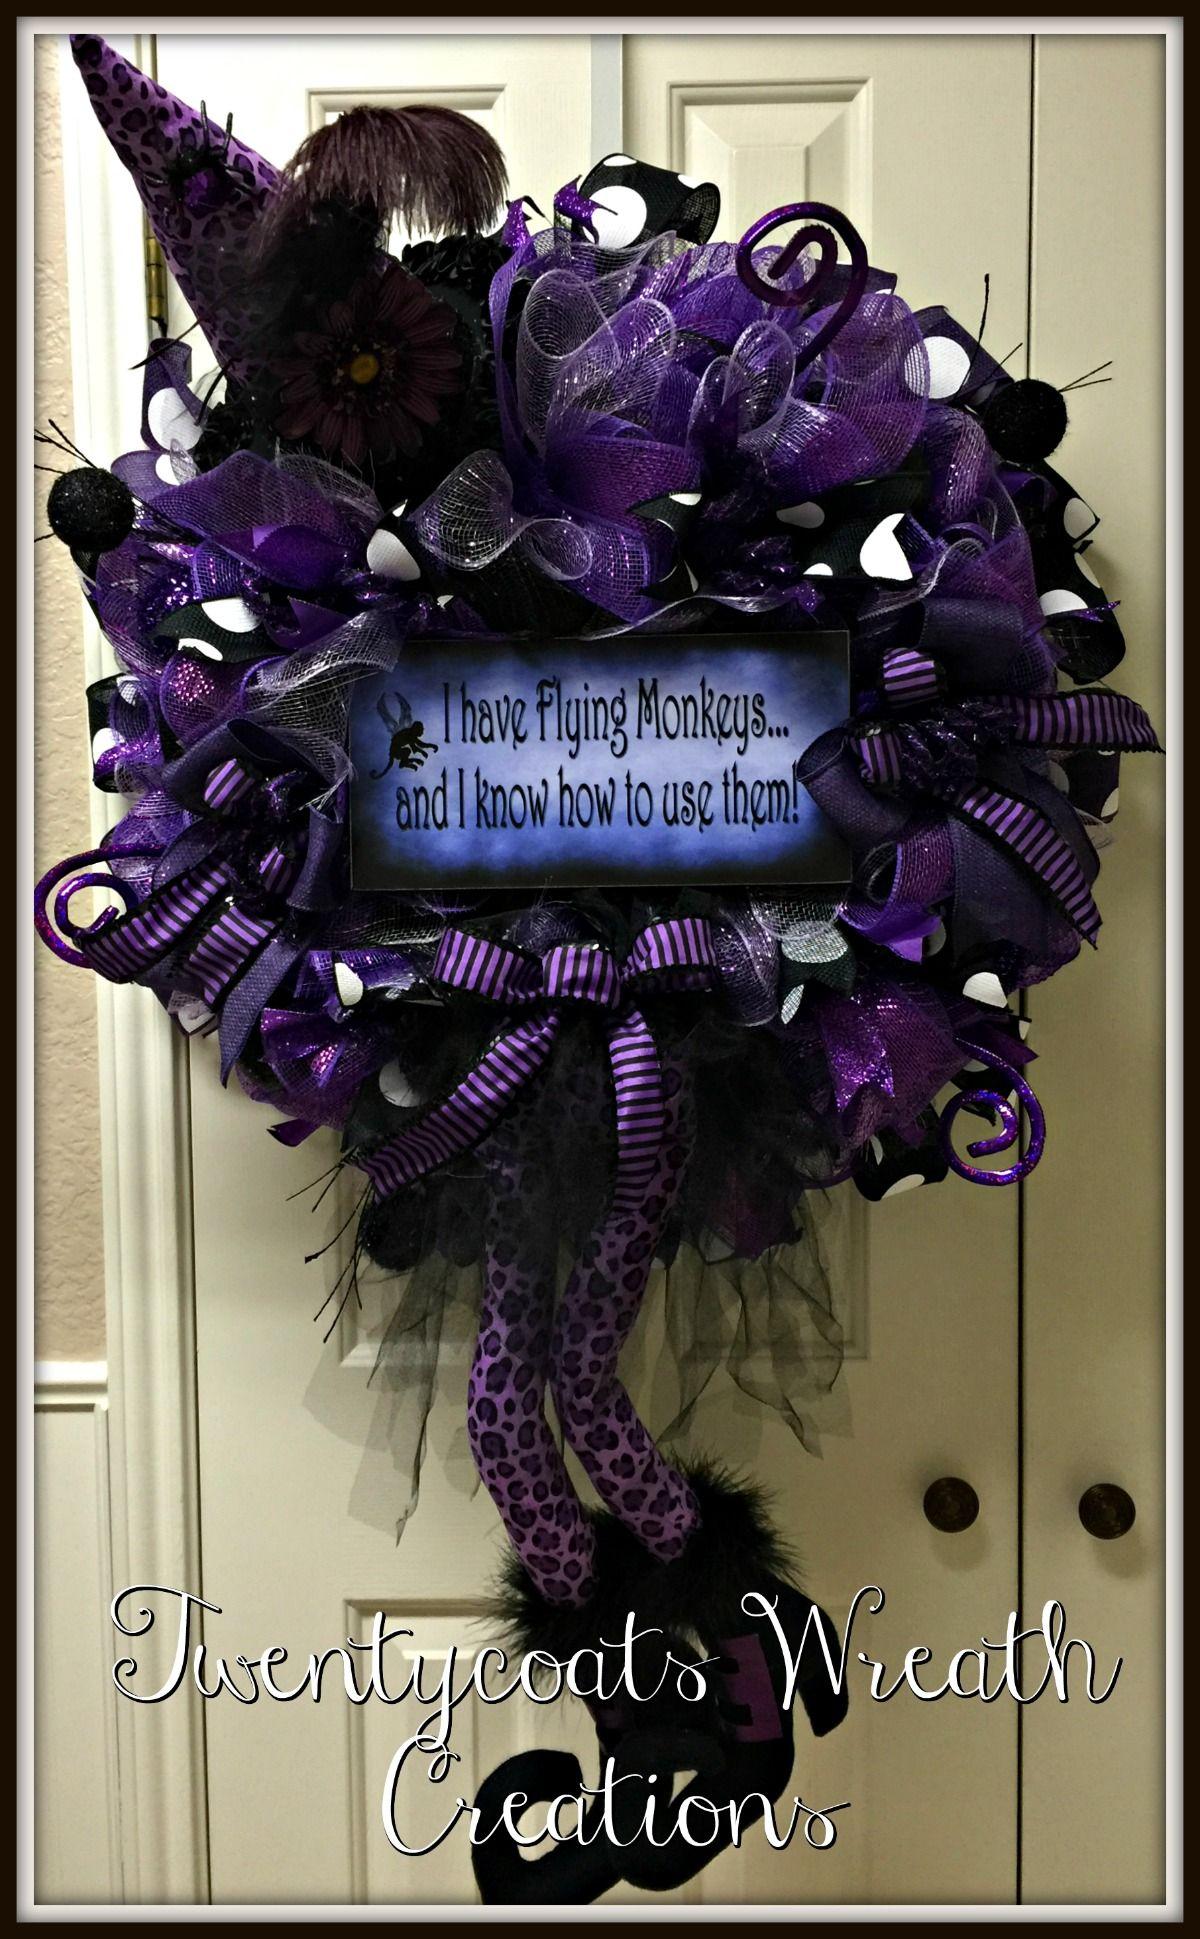 Purple Leopard Deco Mesh Wreath By Twentycoats Wreath Creations